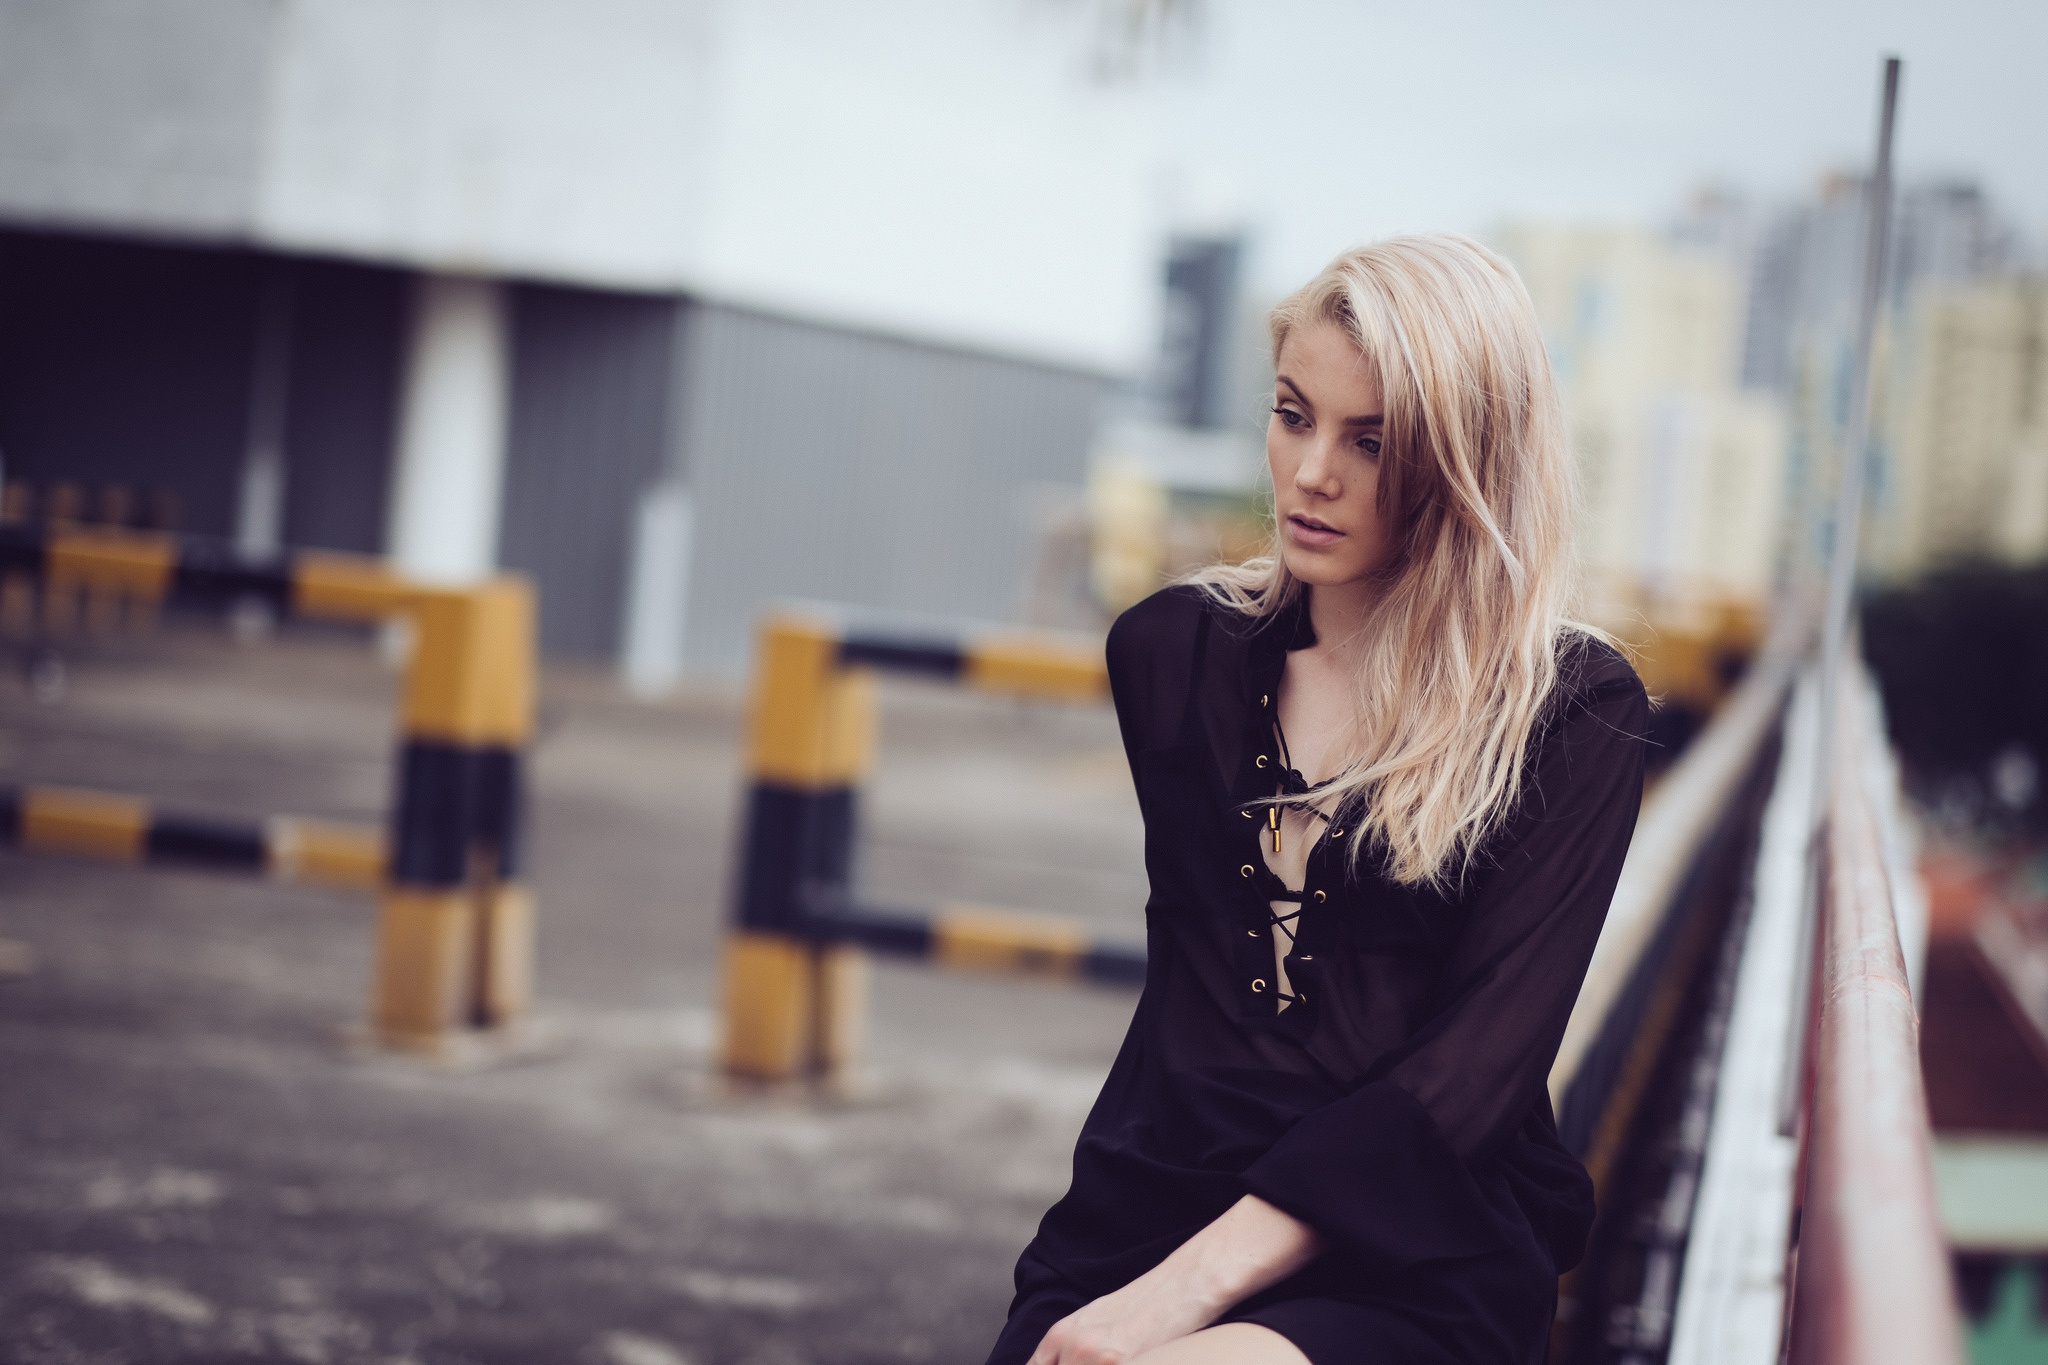 фото девушка расстроена блондинка